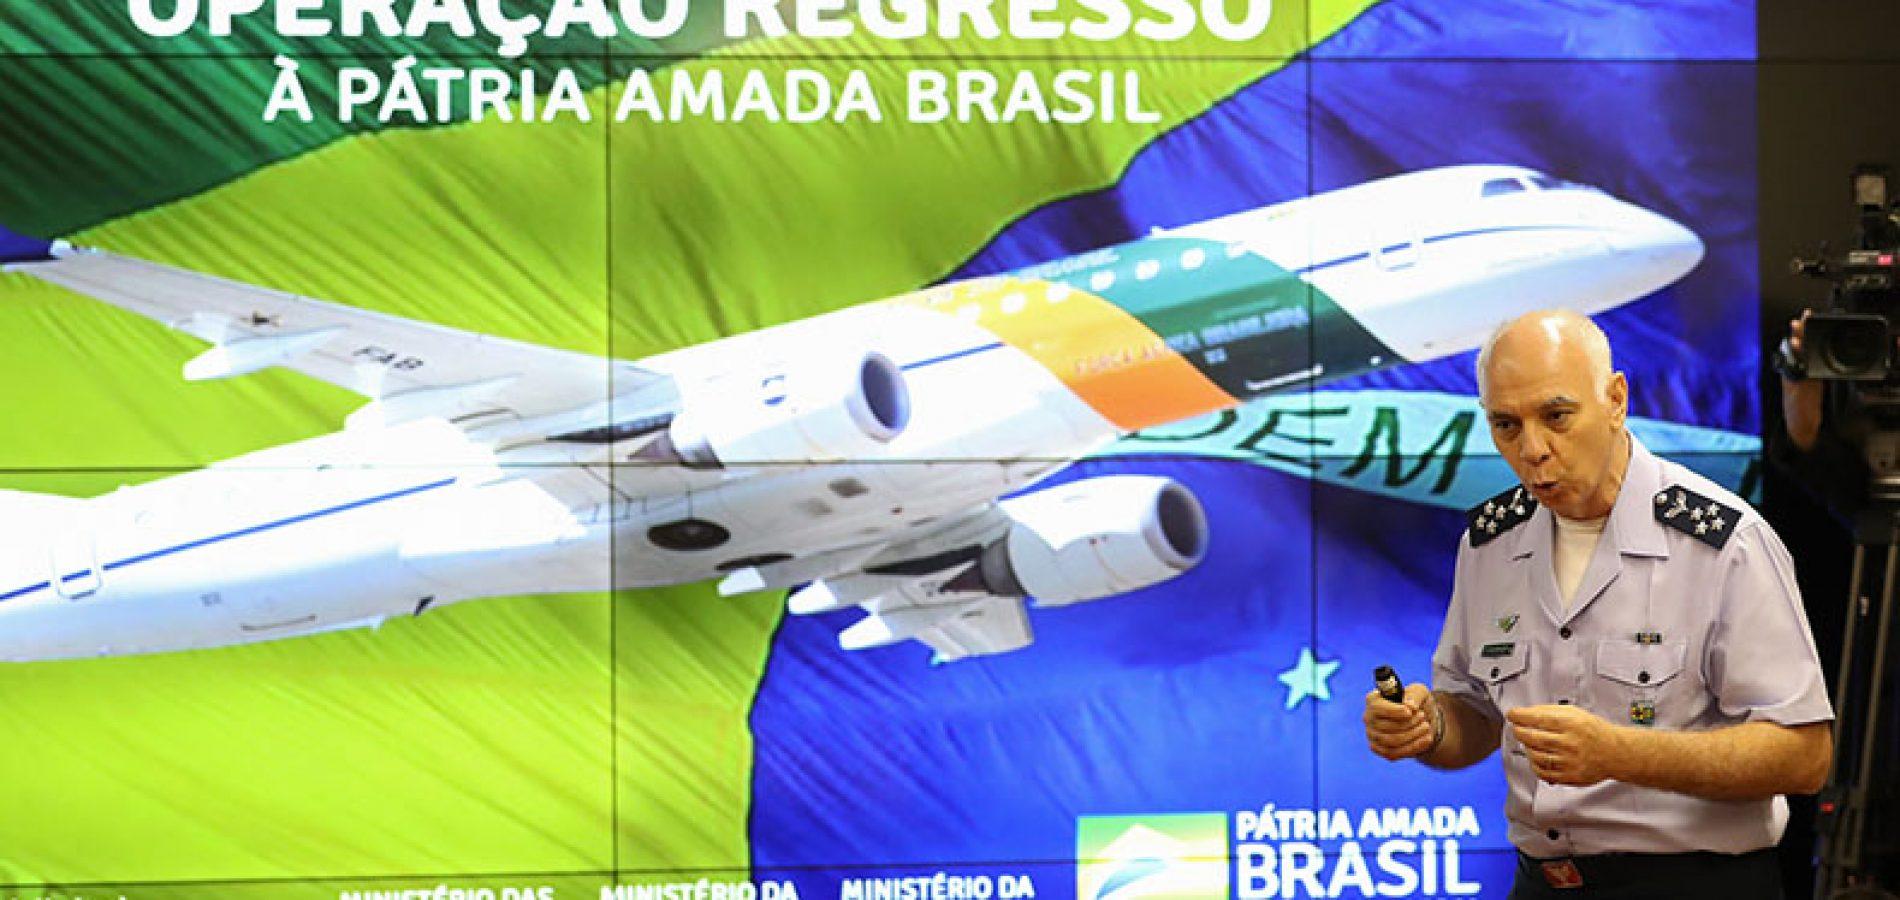 Brasileiros resgatados chegam a Anápolis sem sintomas do coronavírus